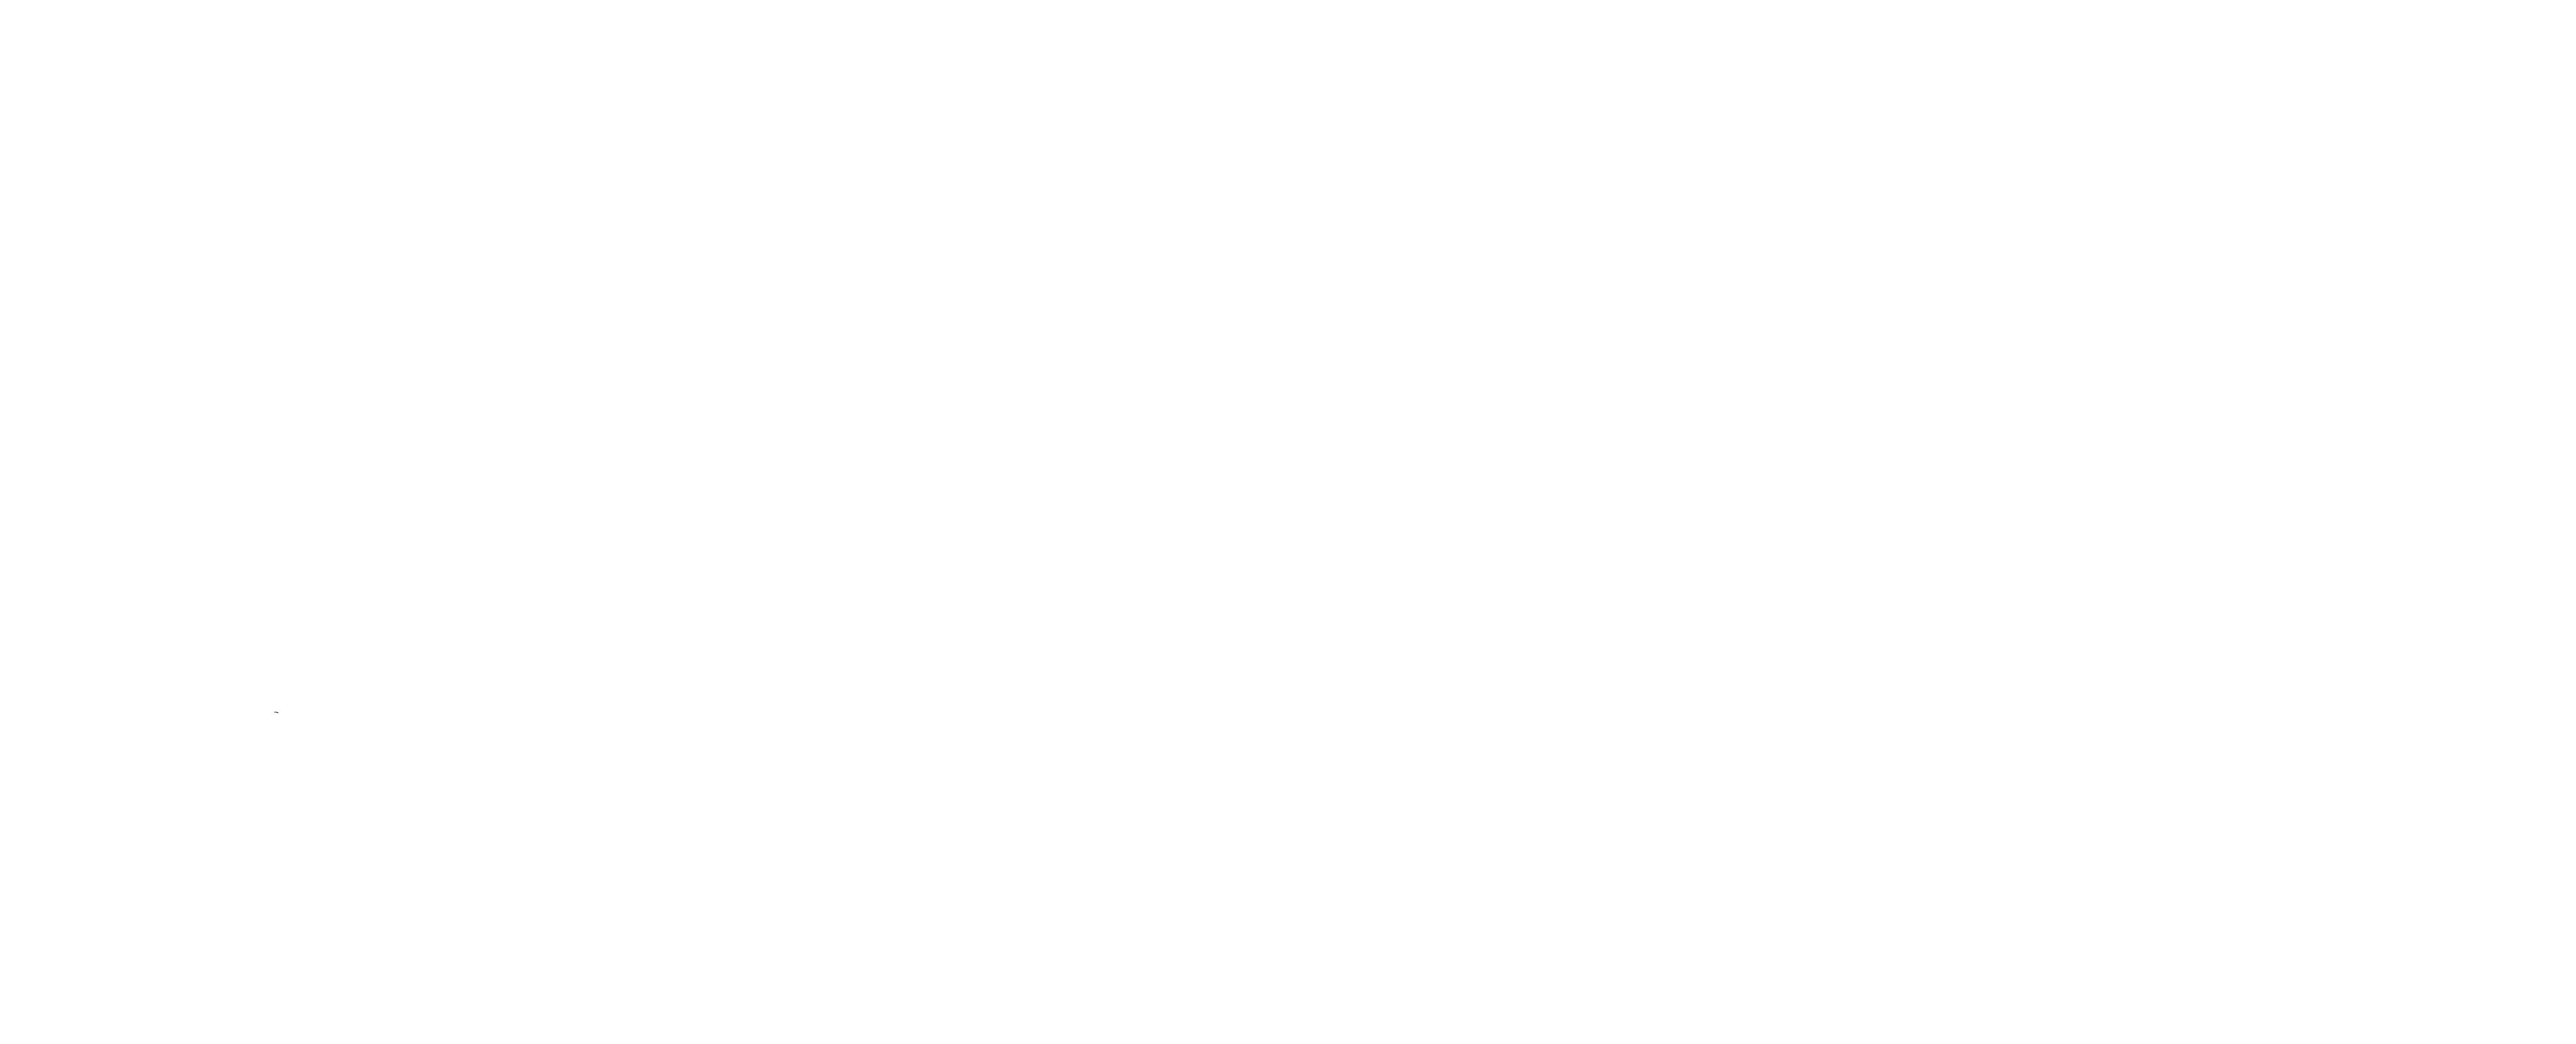 VIT University Bhopal Campus